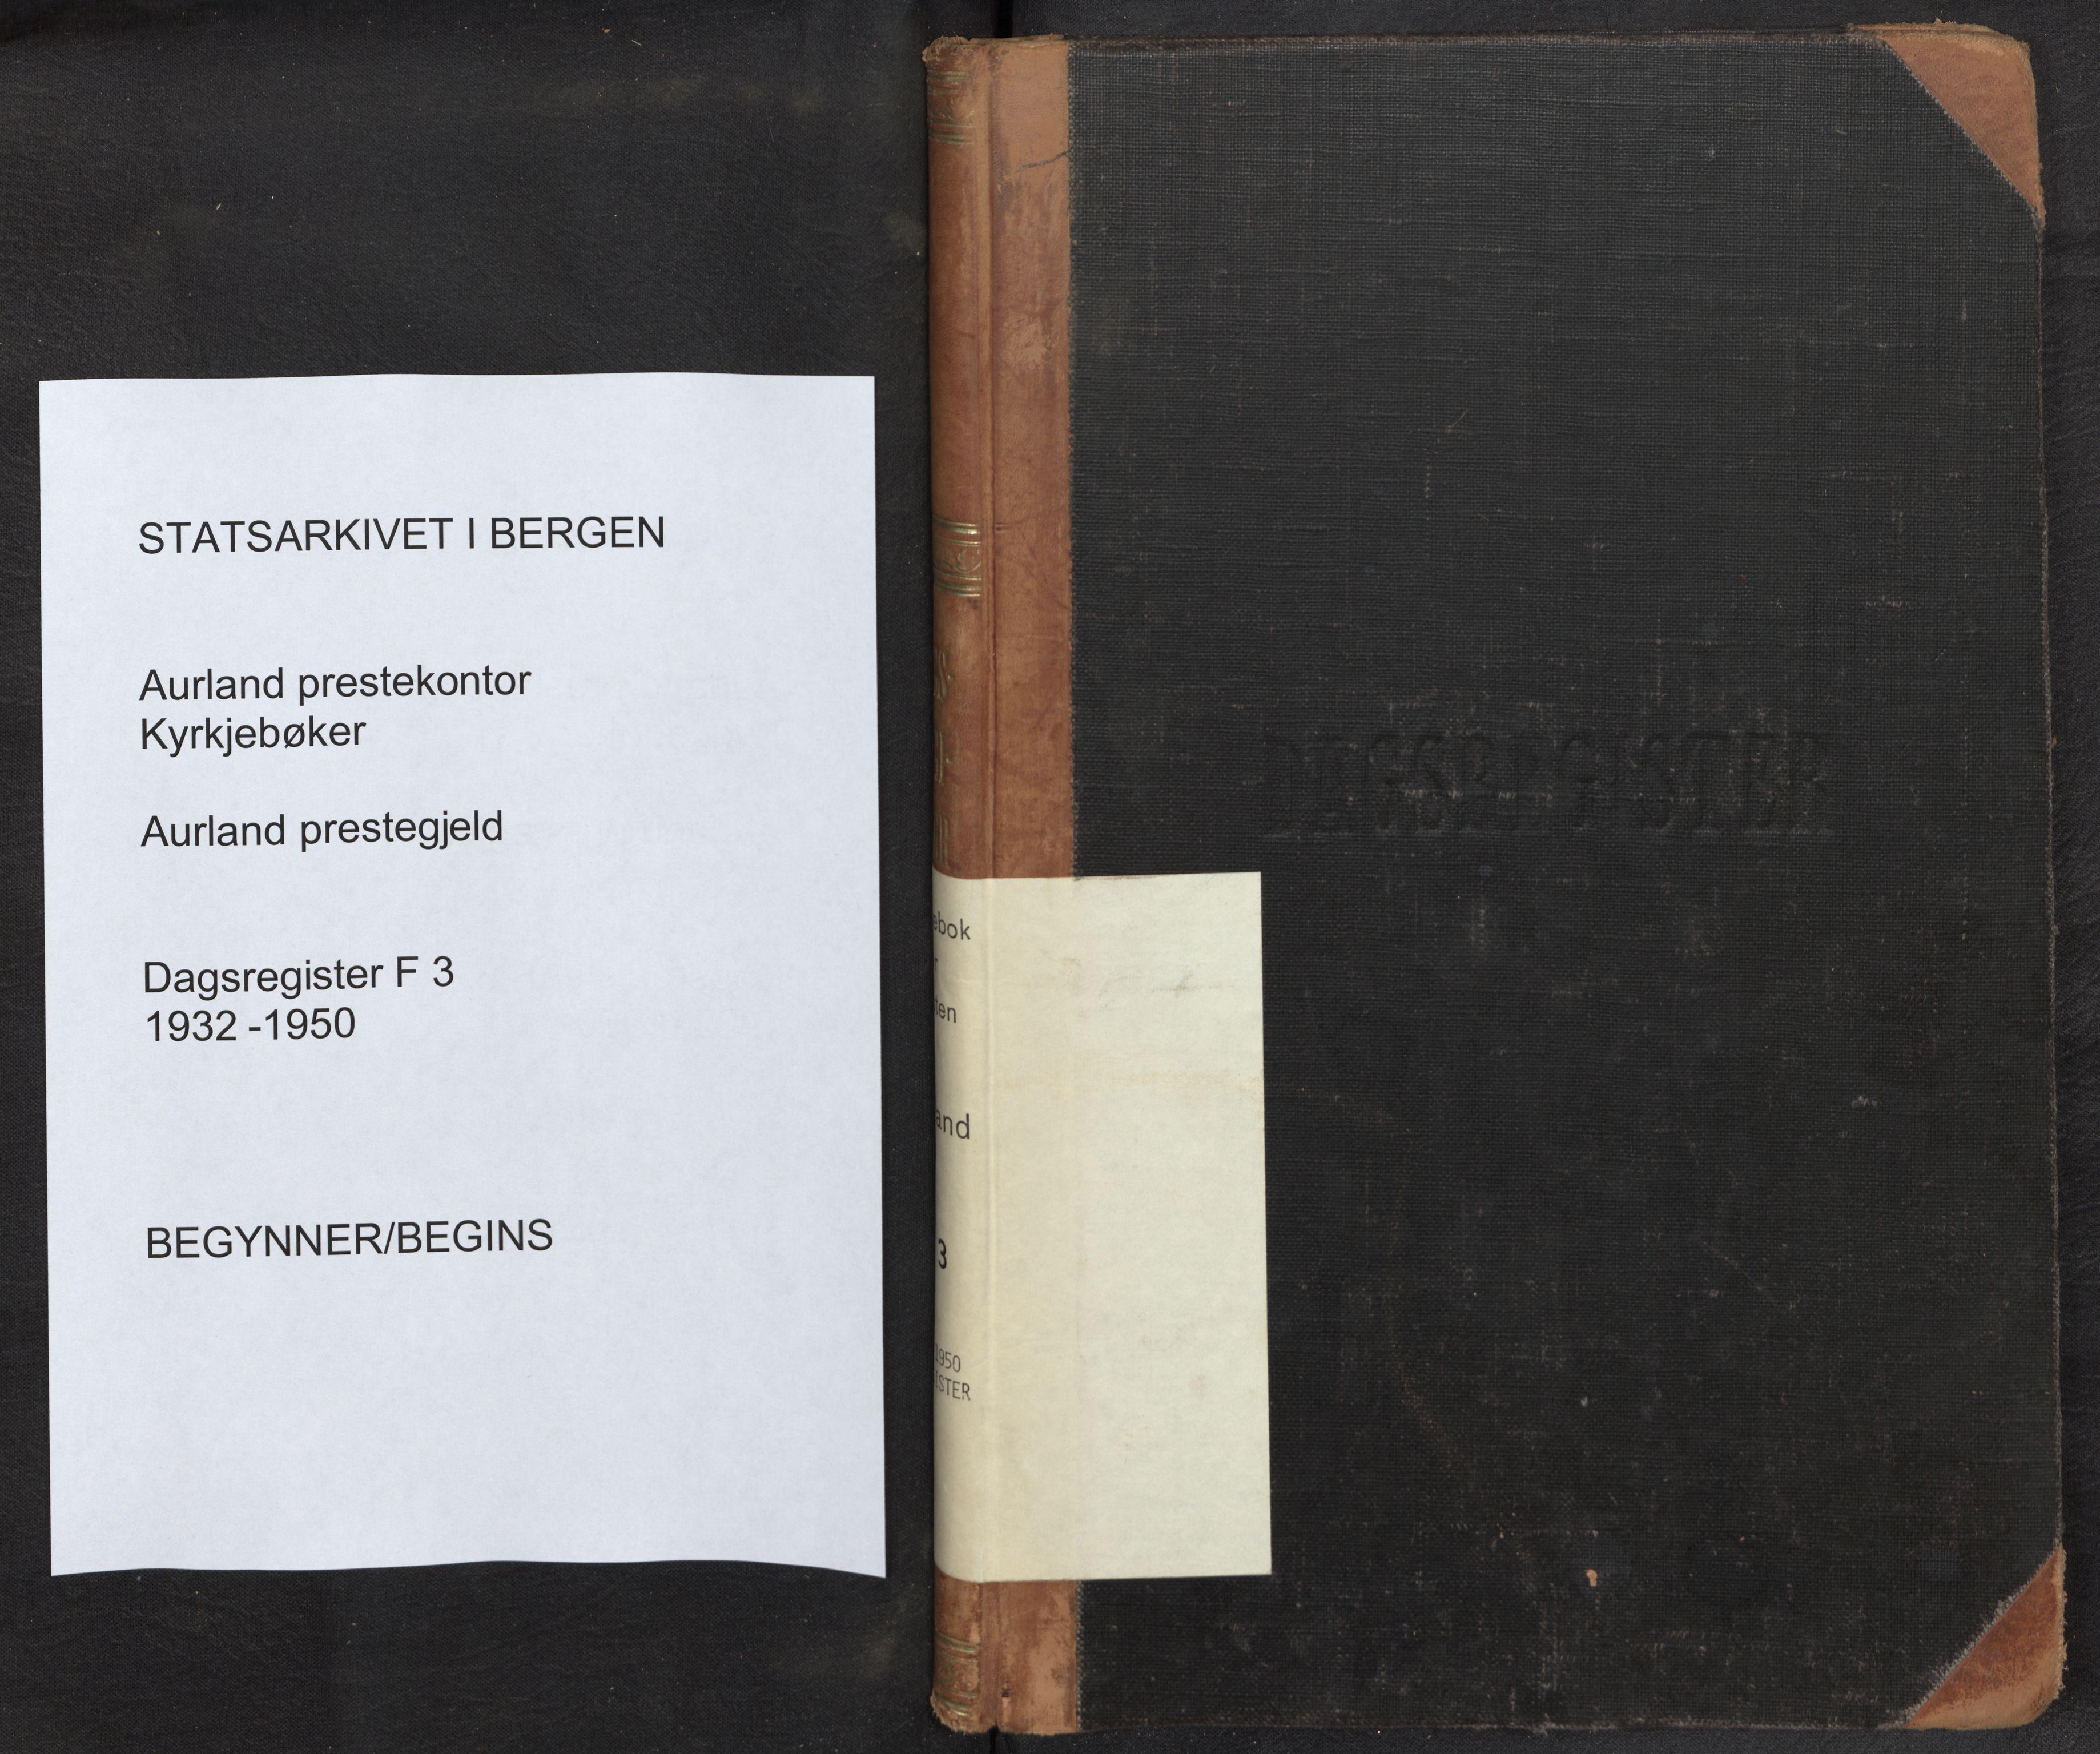 SAB, Aurland sokneprestembete, H/Ha/Haf: Diary records no. F 3, 1932-1950